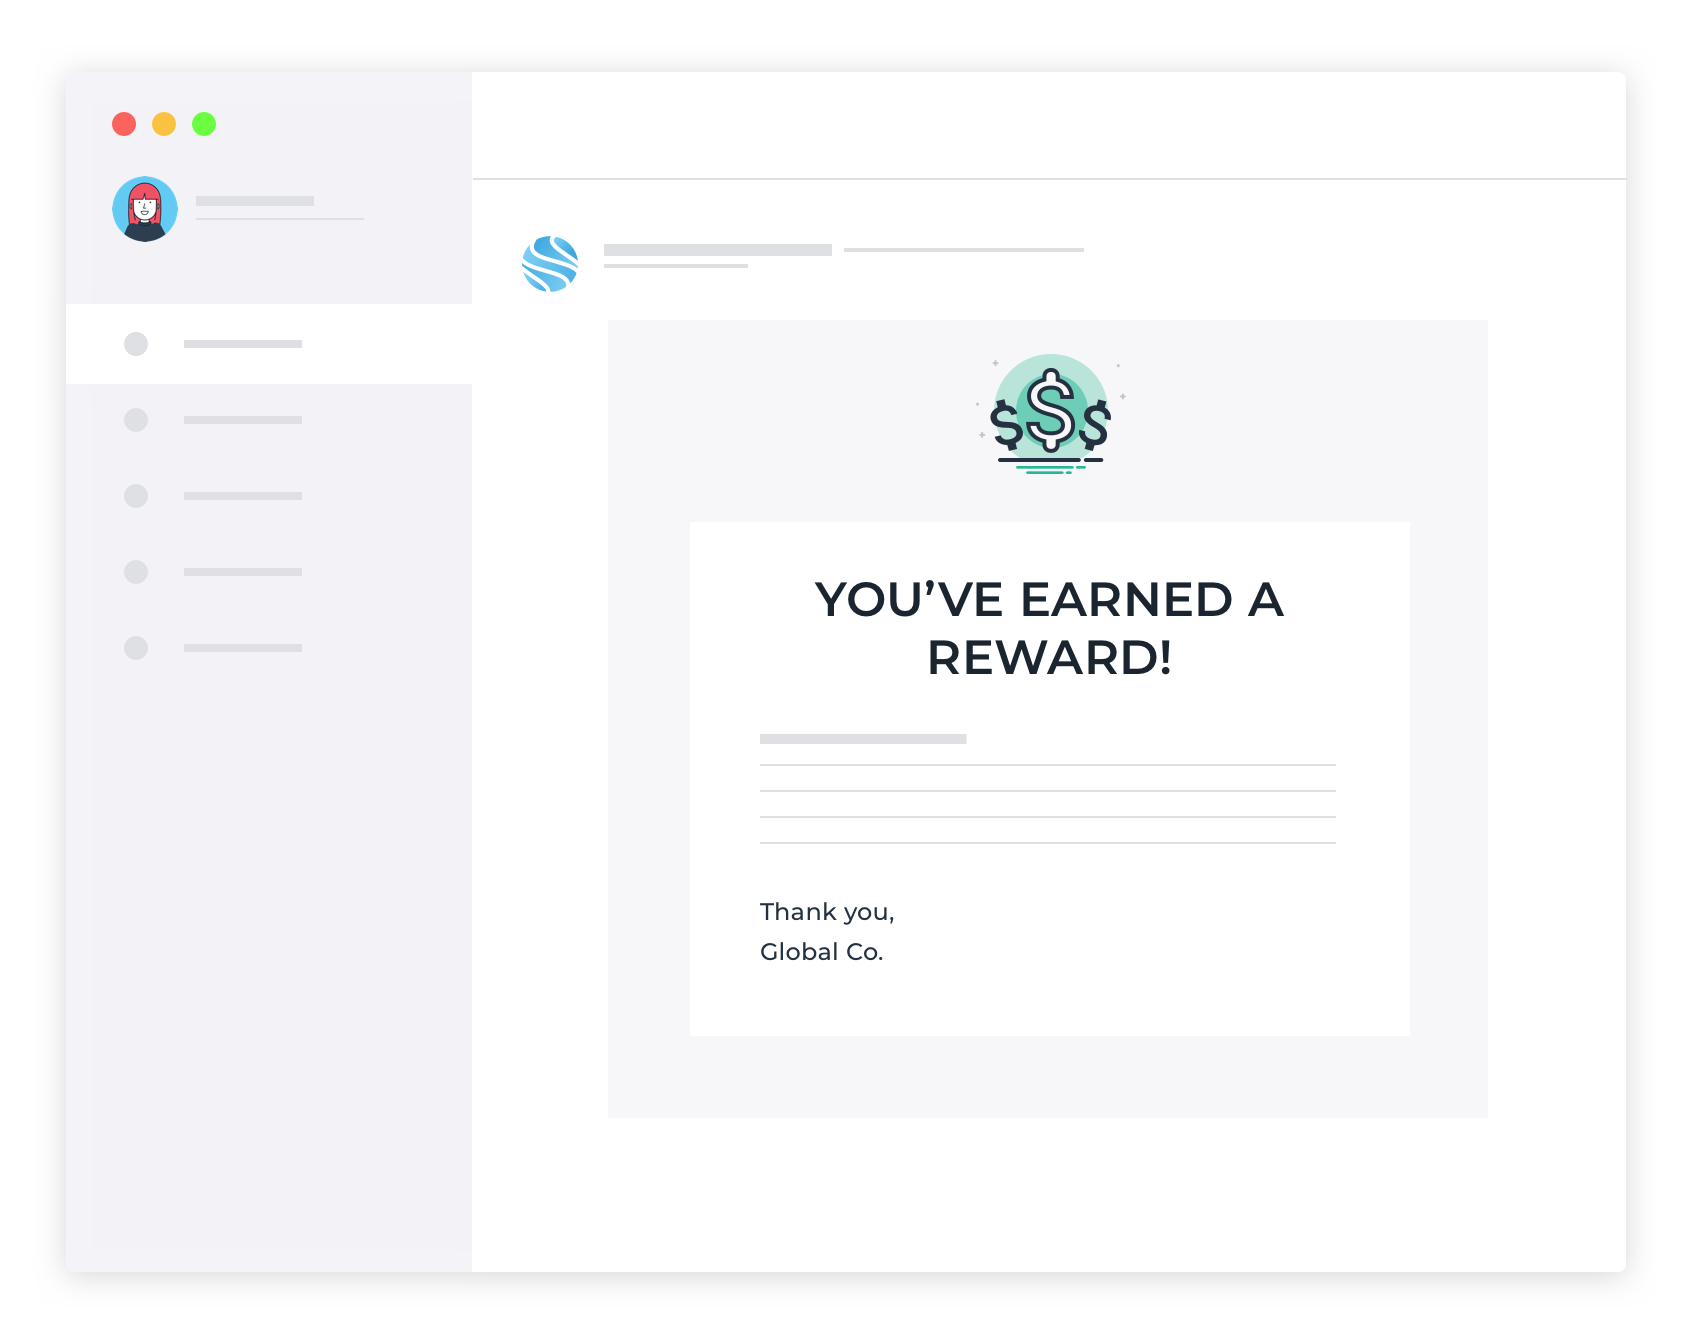 Reward Email V2